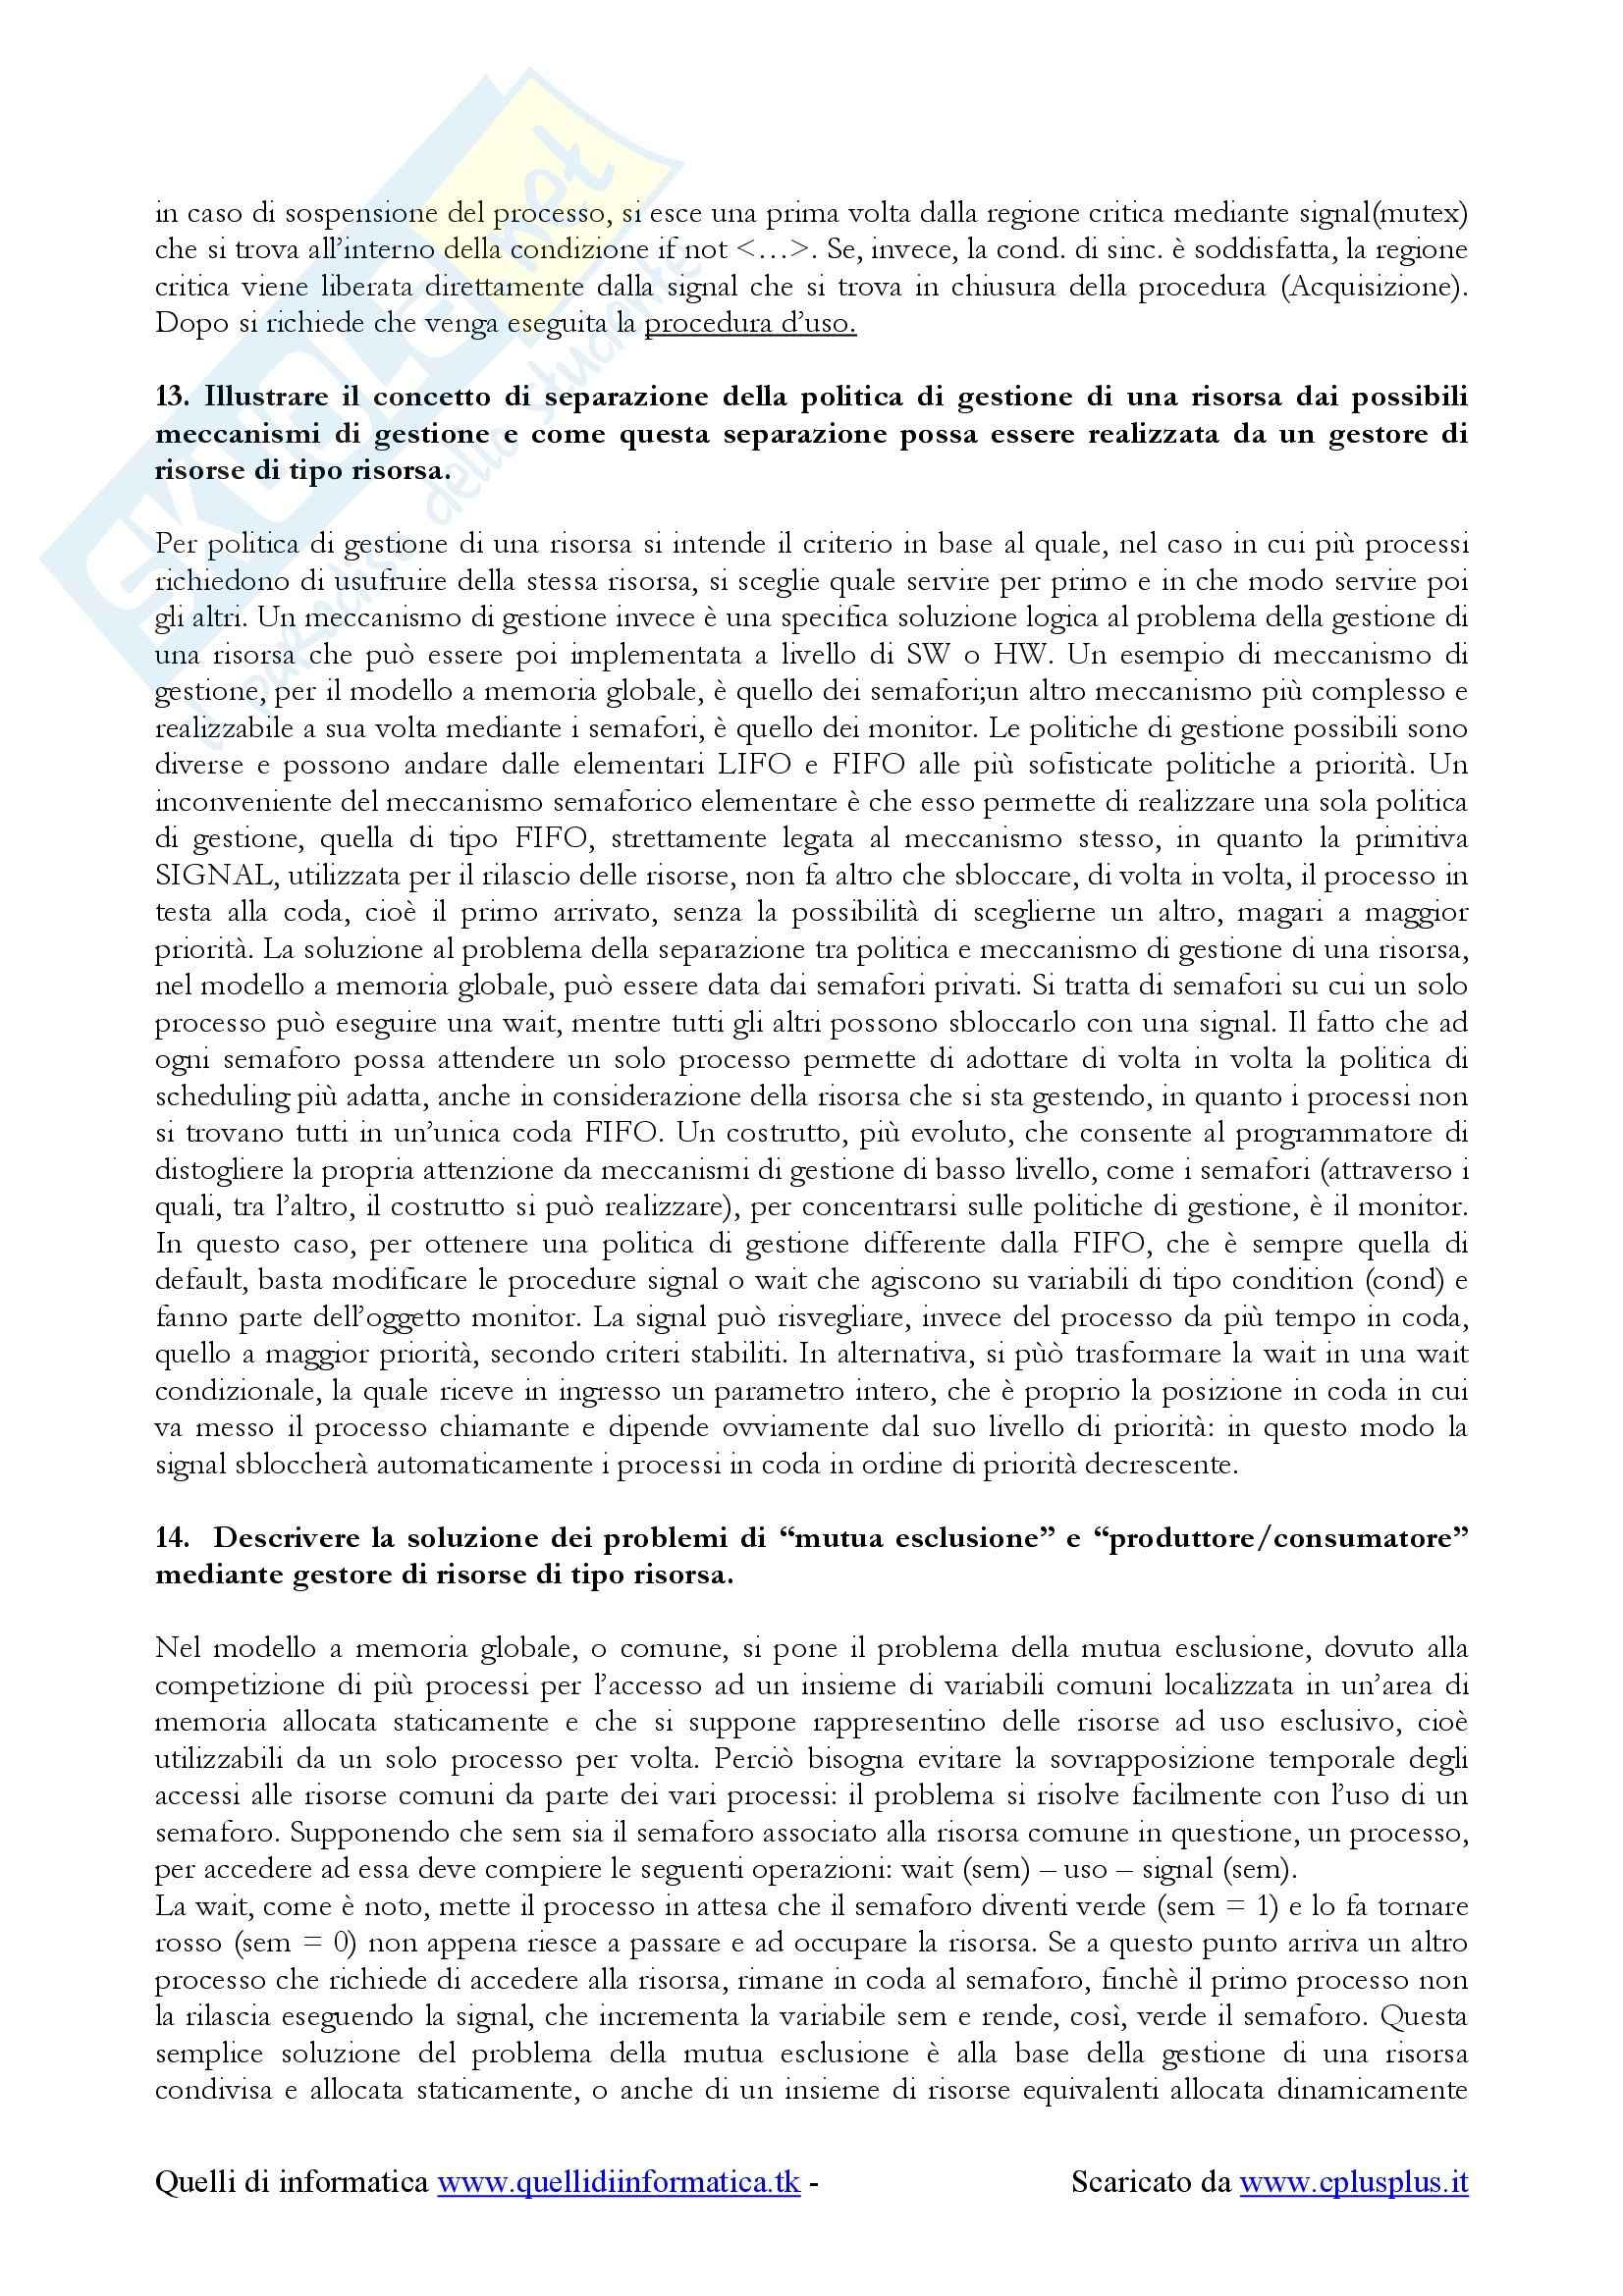 Sistemi operativi - domande esame Pag. 11